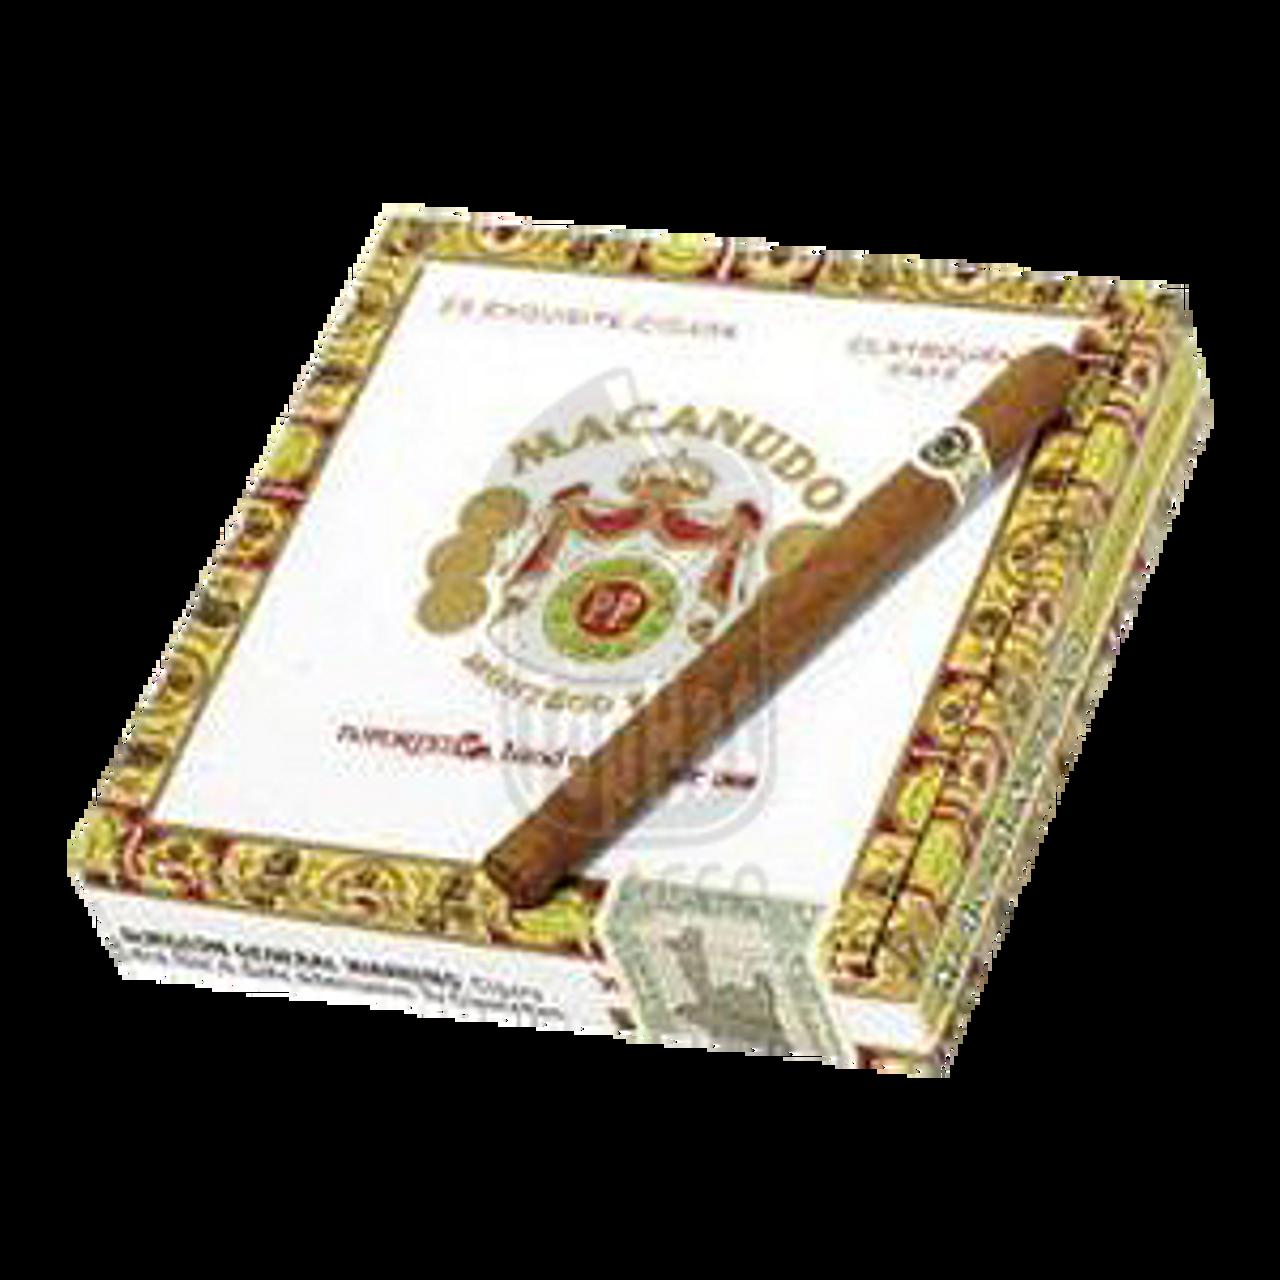 Macanudo Claybourne Cigars - 6 x 31 (Box of 25)